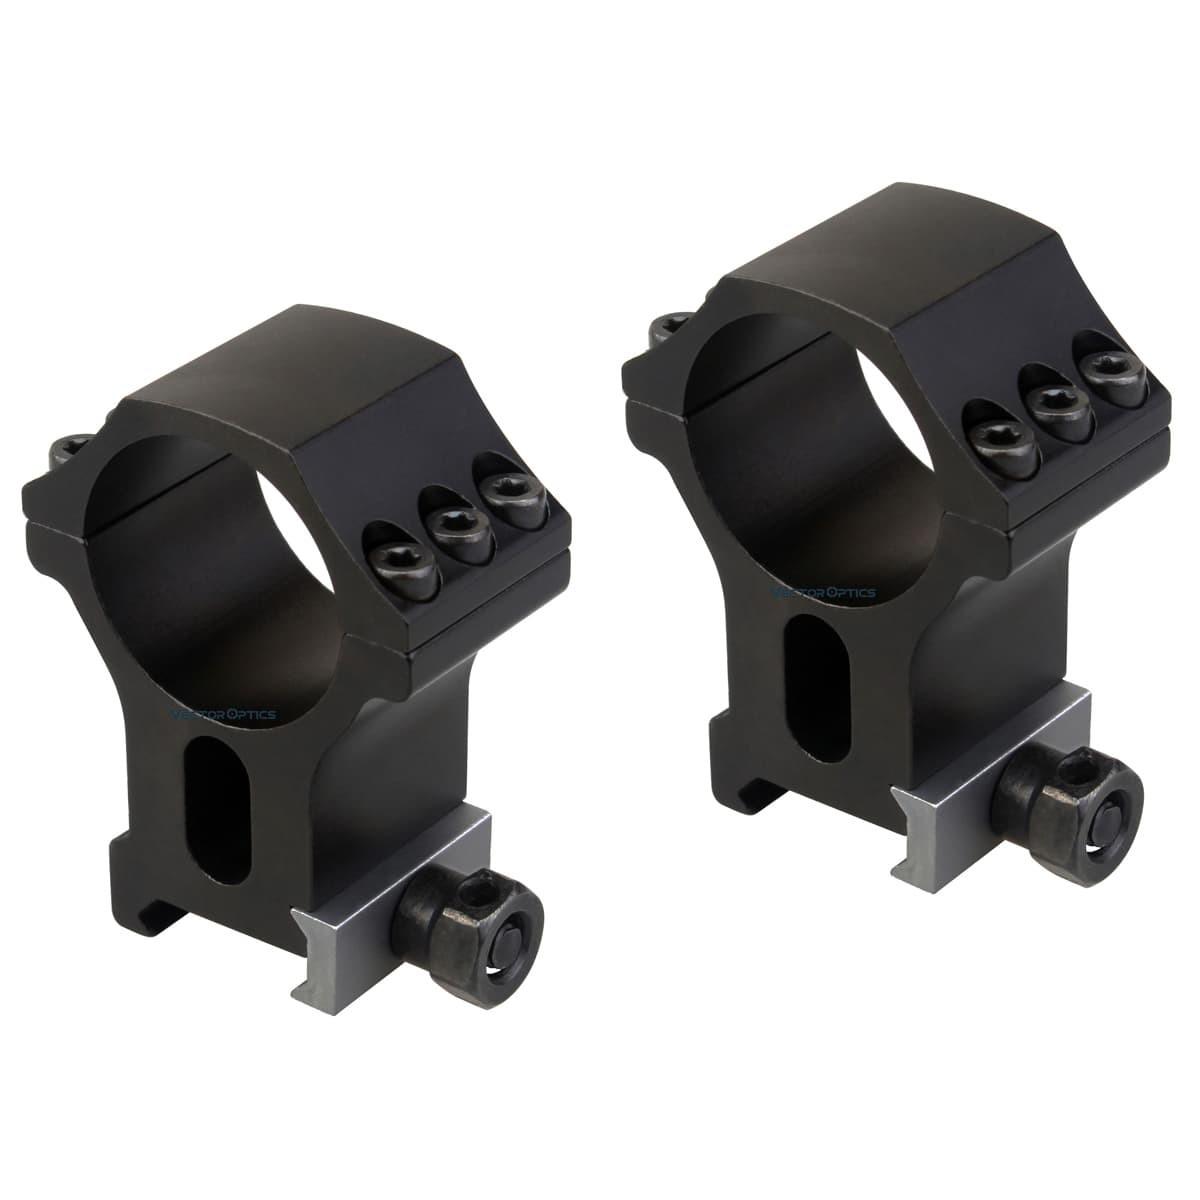 Paragon 5-25x56SFP GenII Riflescope